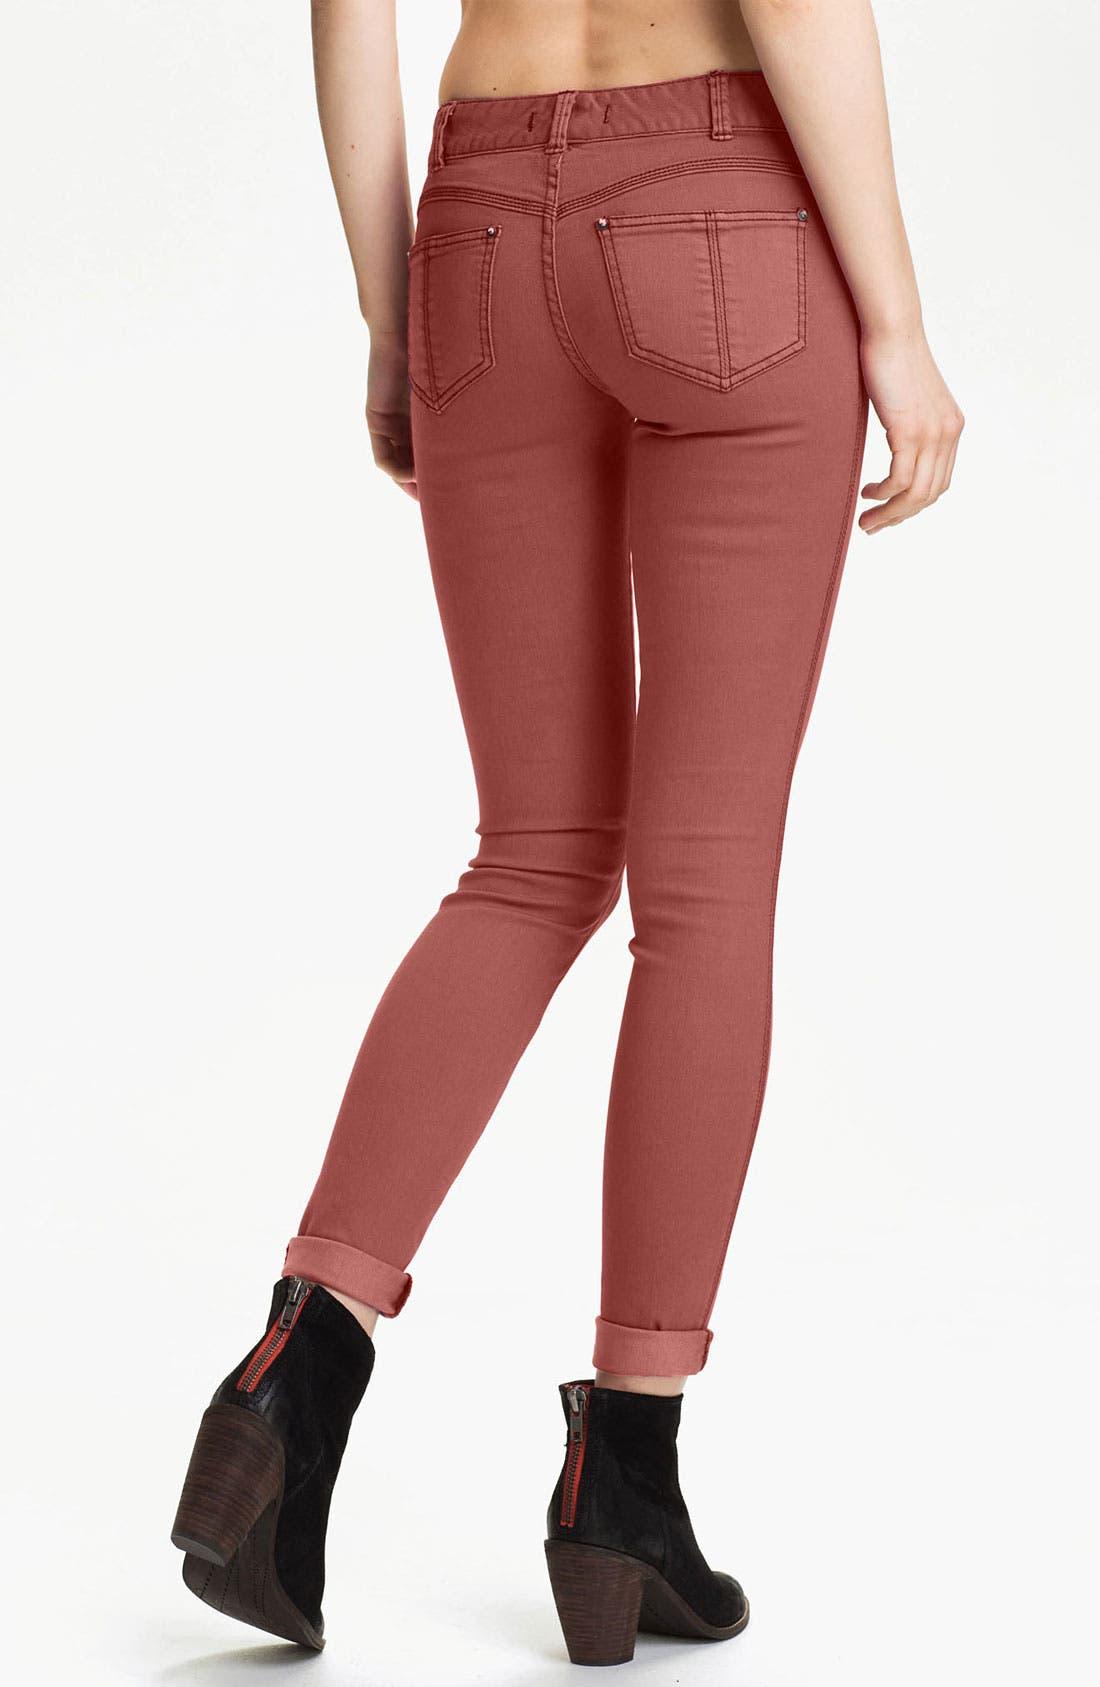 Alternate Image 2  - Free People Colored Stretch Denim Skinny Jeans (Maroon)